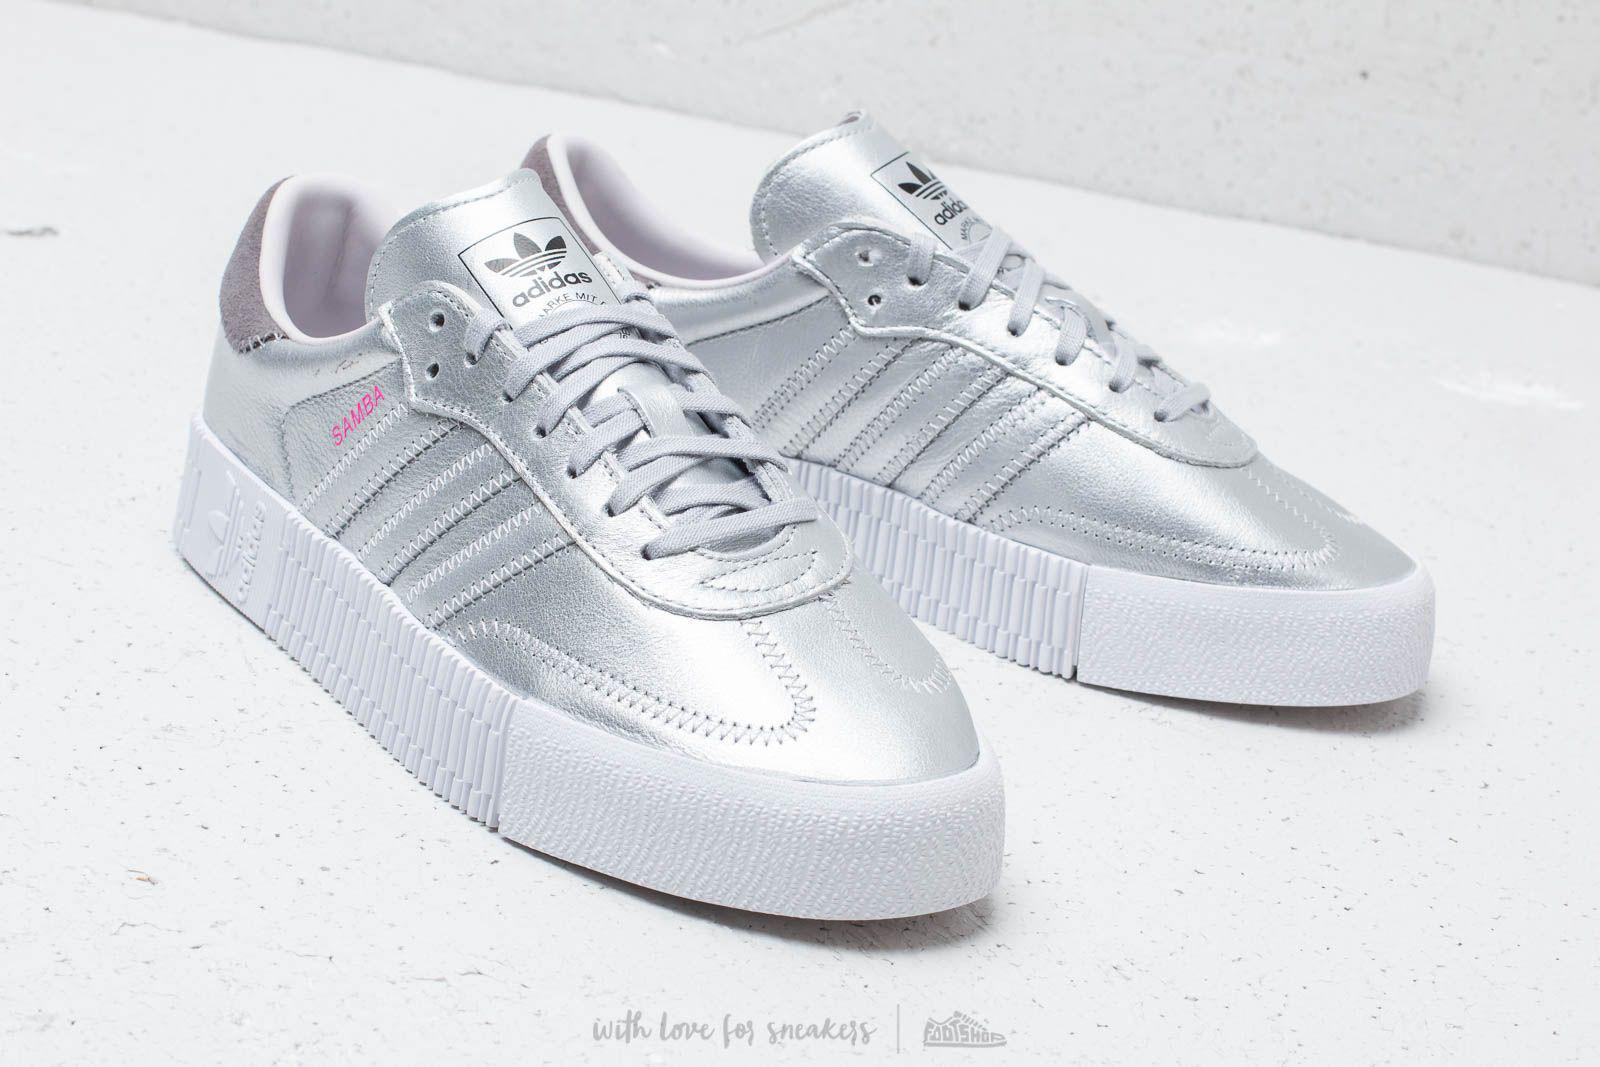 5353e7f5361c Lyst - adidas Originals Adidas Sambarose W Silver Metallic  Silver ...